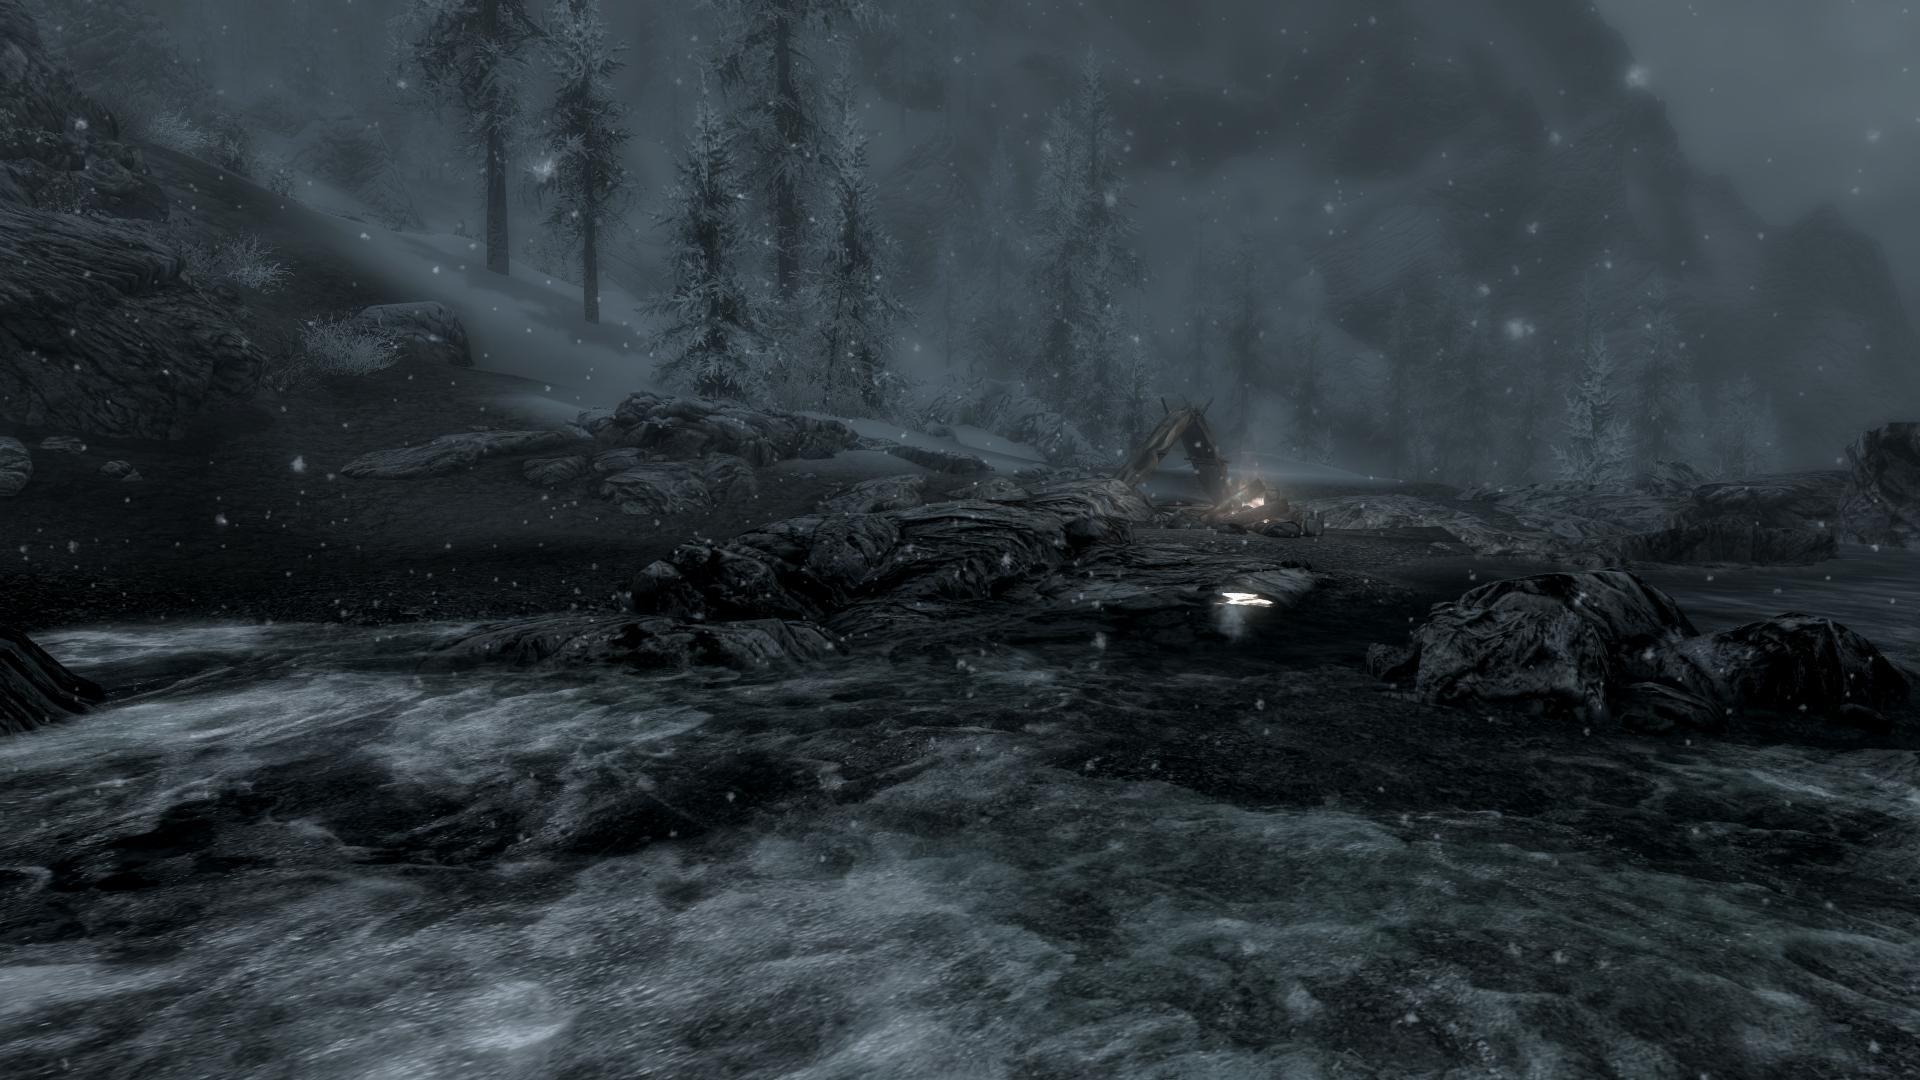 000193.Jpg - Elder Scrolls 5: Skyrim, the